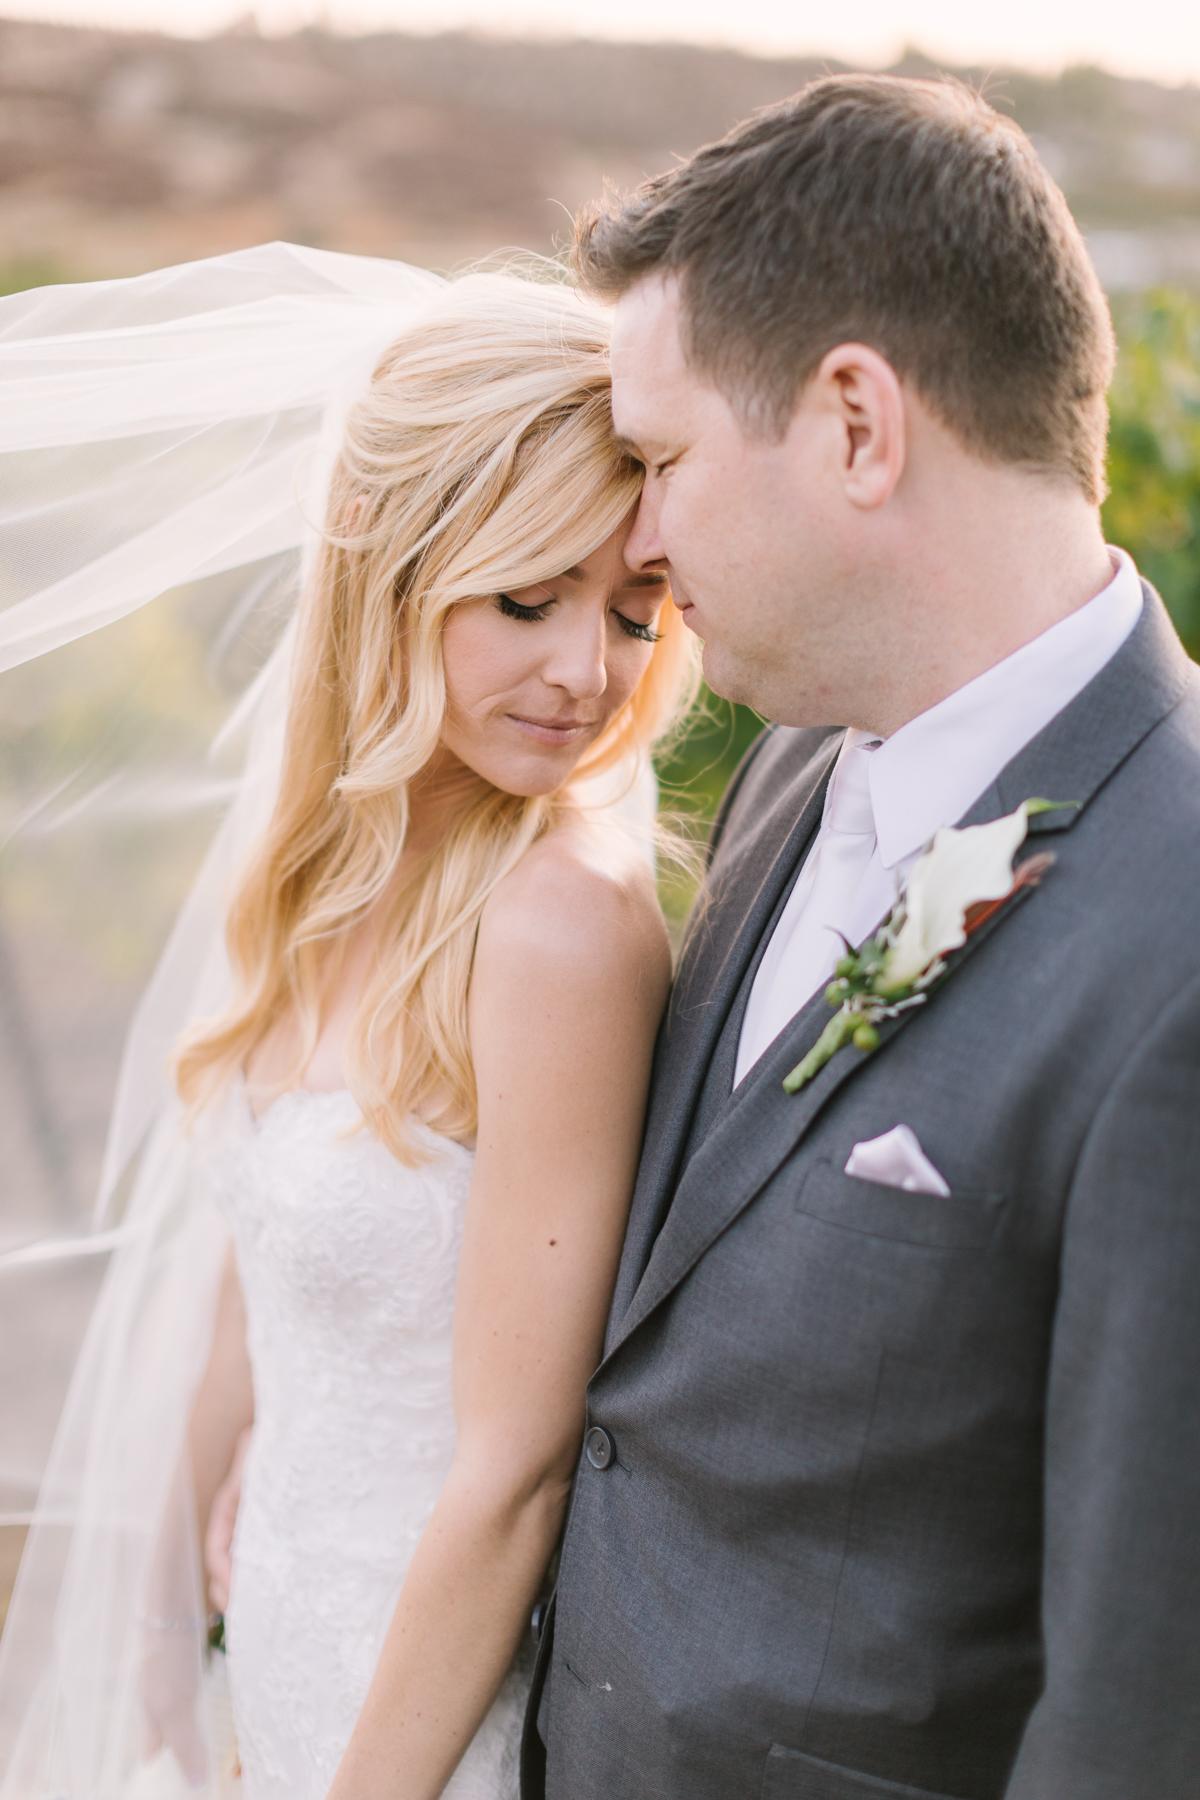 Orange-County-Wedding-Photography-Brianna-Caster-and-Co-Photographers-Falkner-Winery-Wedding-13